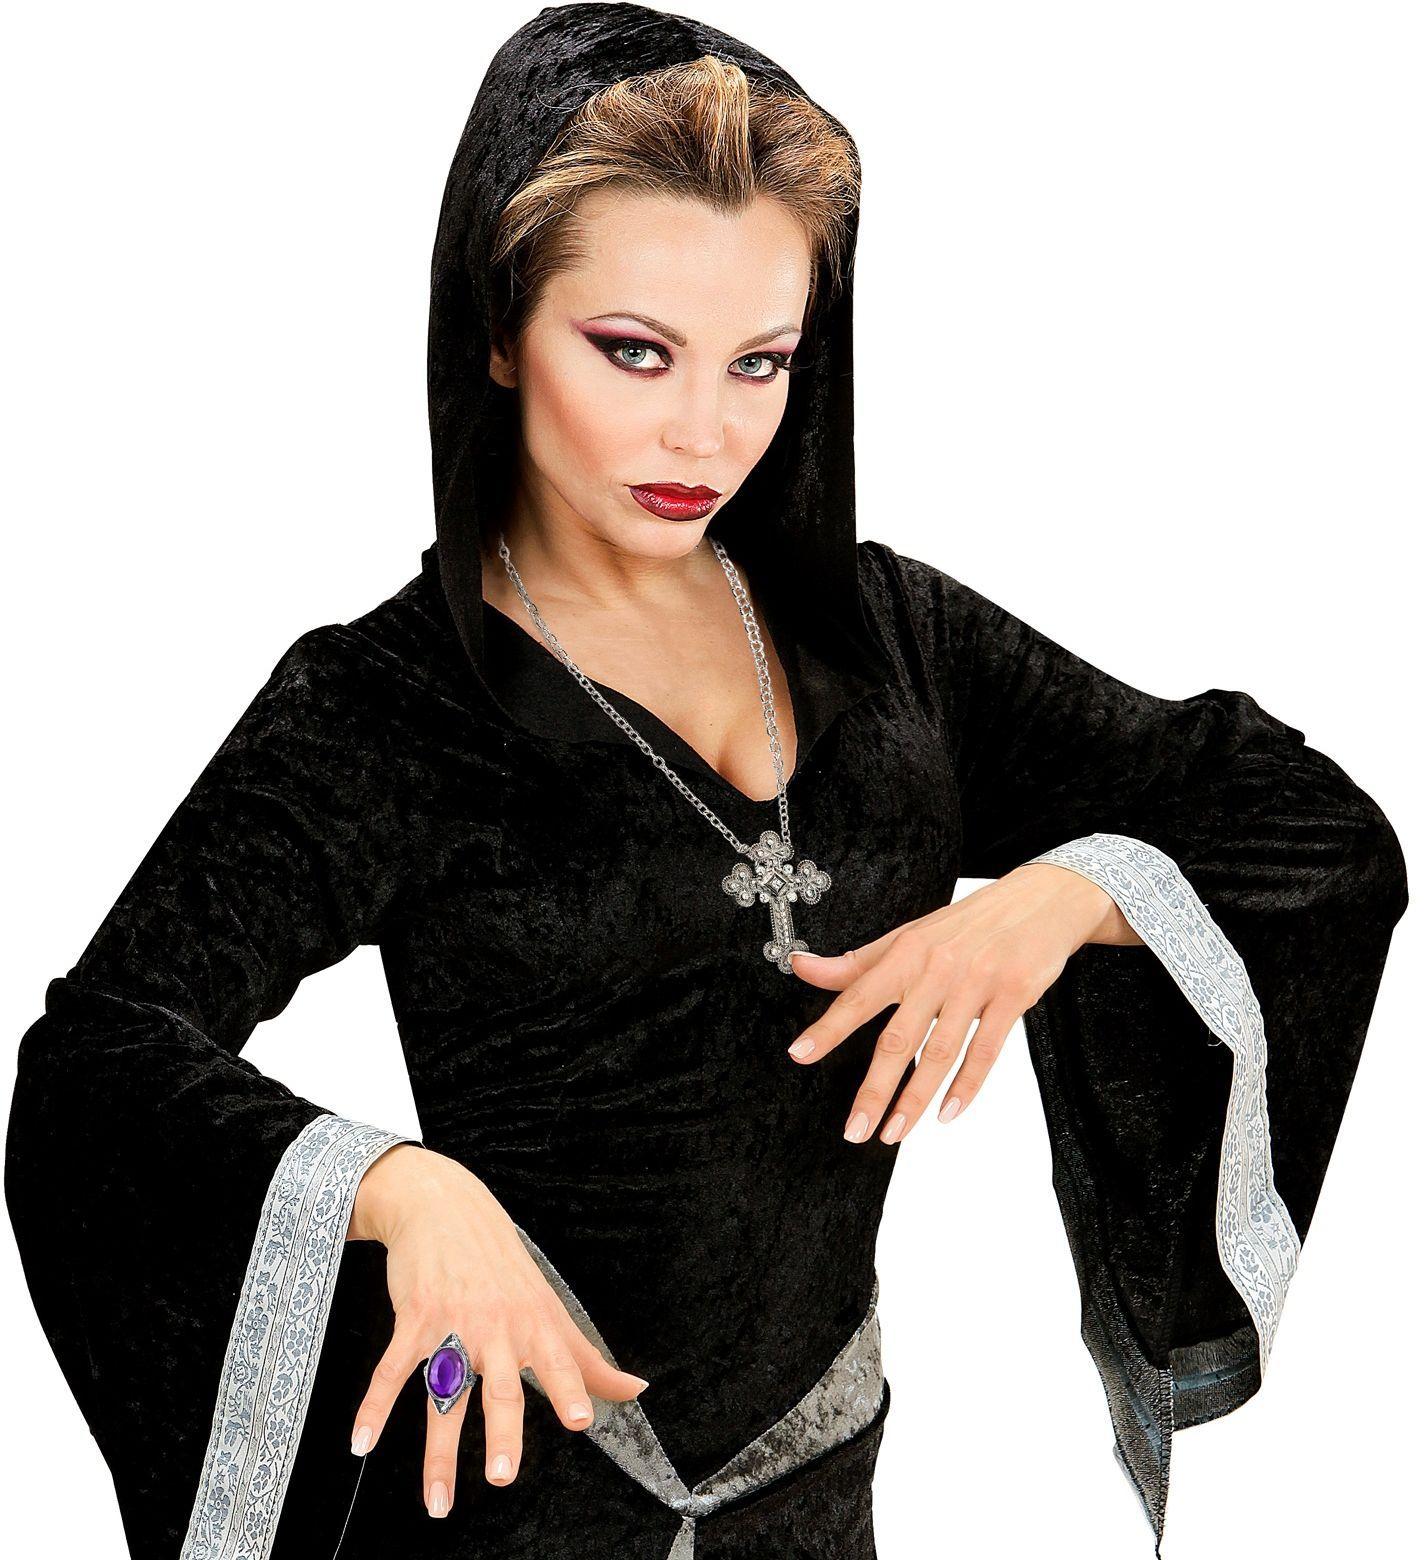 Gothic ring met paarse steen